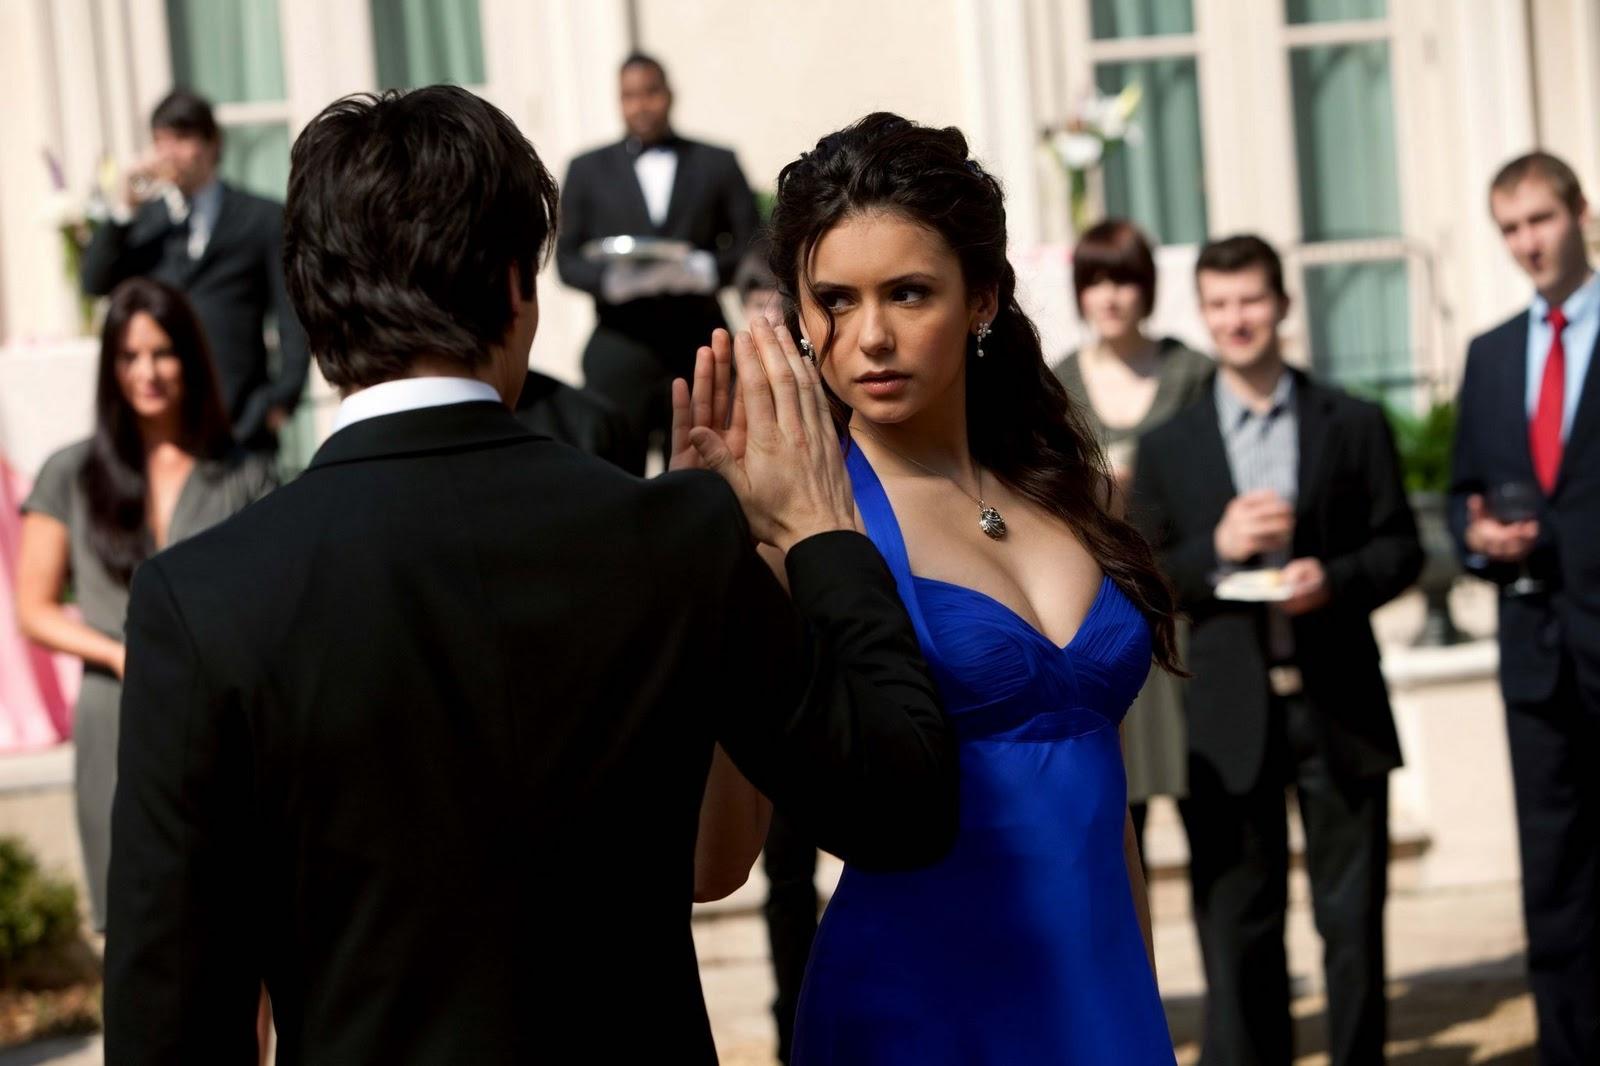 http://2.bp.blogspot.com/-qRqOZmGS7Hg/Tx3wqcT7G7I/AAAAAAAACeM/wLy3KywBlVo/s1600/elena+gilbert+nina+dobrev+the+vampire+diaries+diarios+de+um+vampiro+vestido+azul+blue+dress+1x19+capitulo+fashion+moda+estilo+gabby+gabbyestevao+gabby_estevao+blog+%25285%2529.jpg